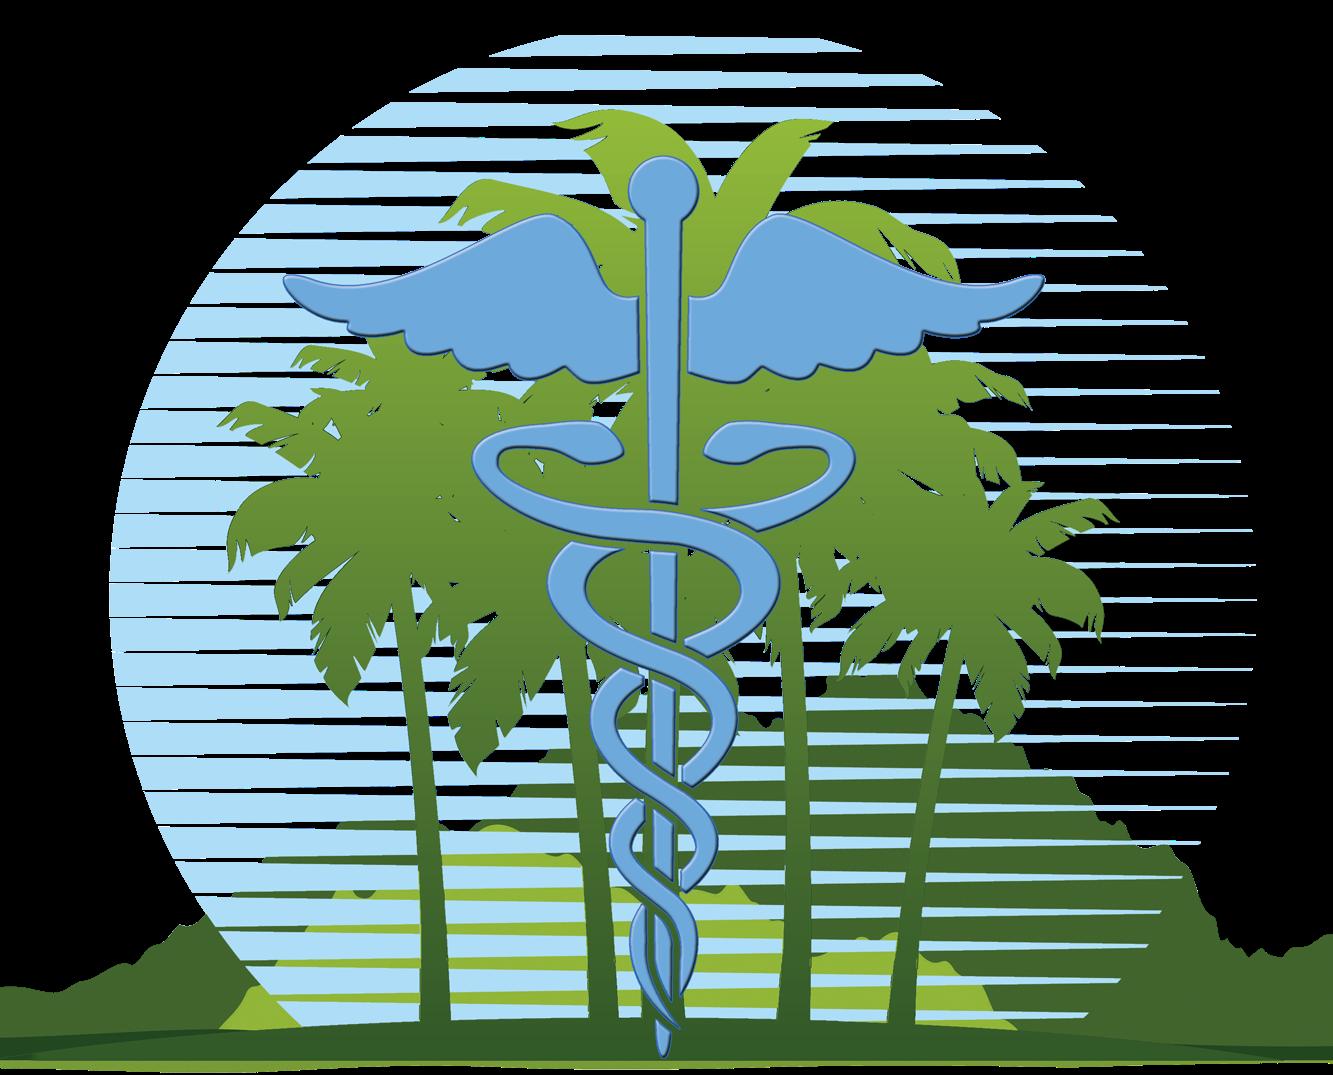 West maui and medical. Neighborhood clipart hospital environment